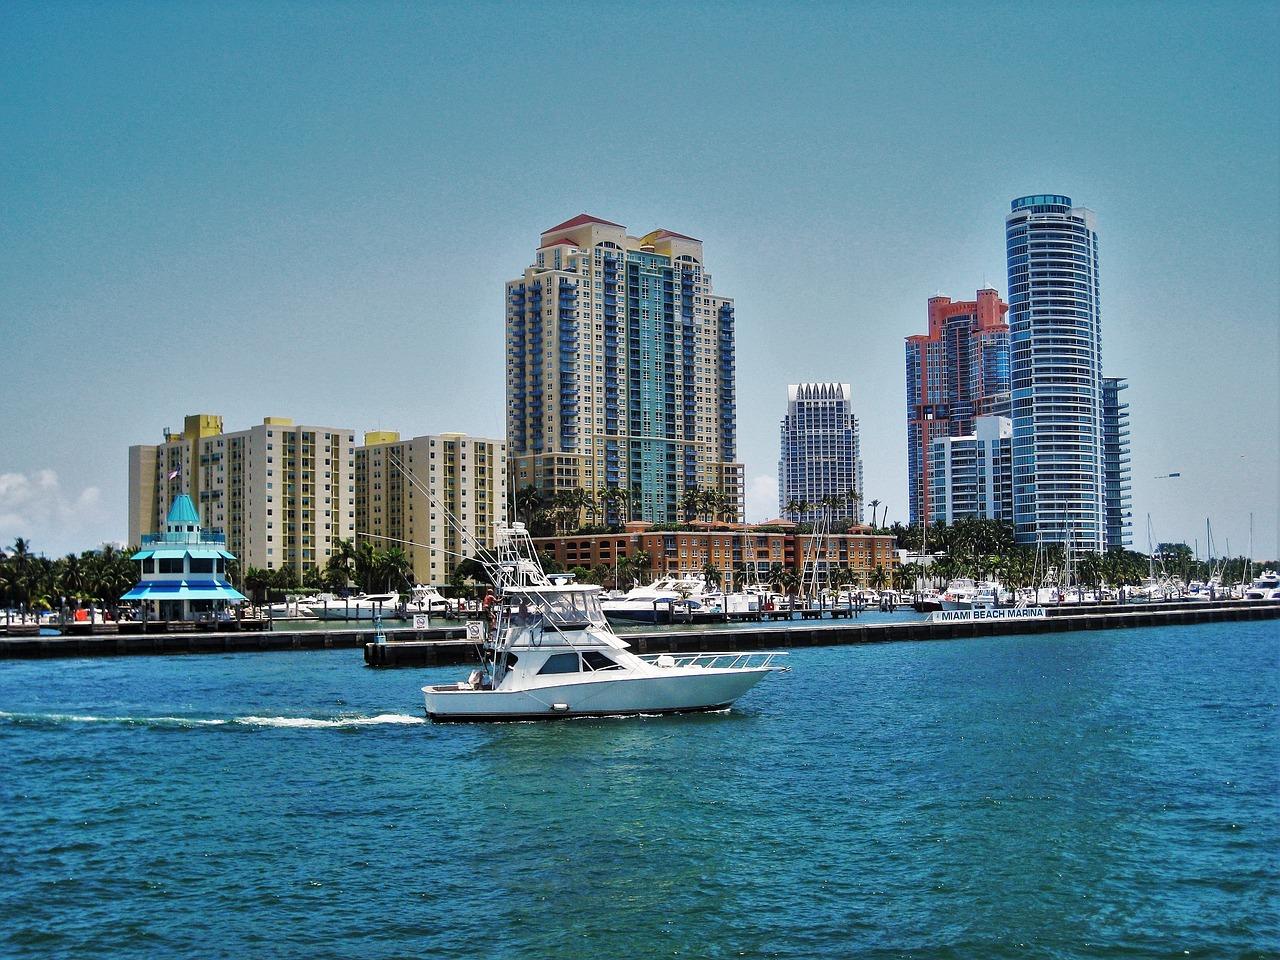 Miami Beach Marina Floride - Photo gratuite sur Pixabay